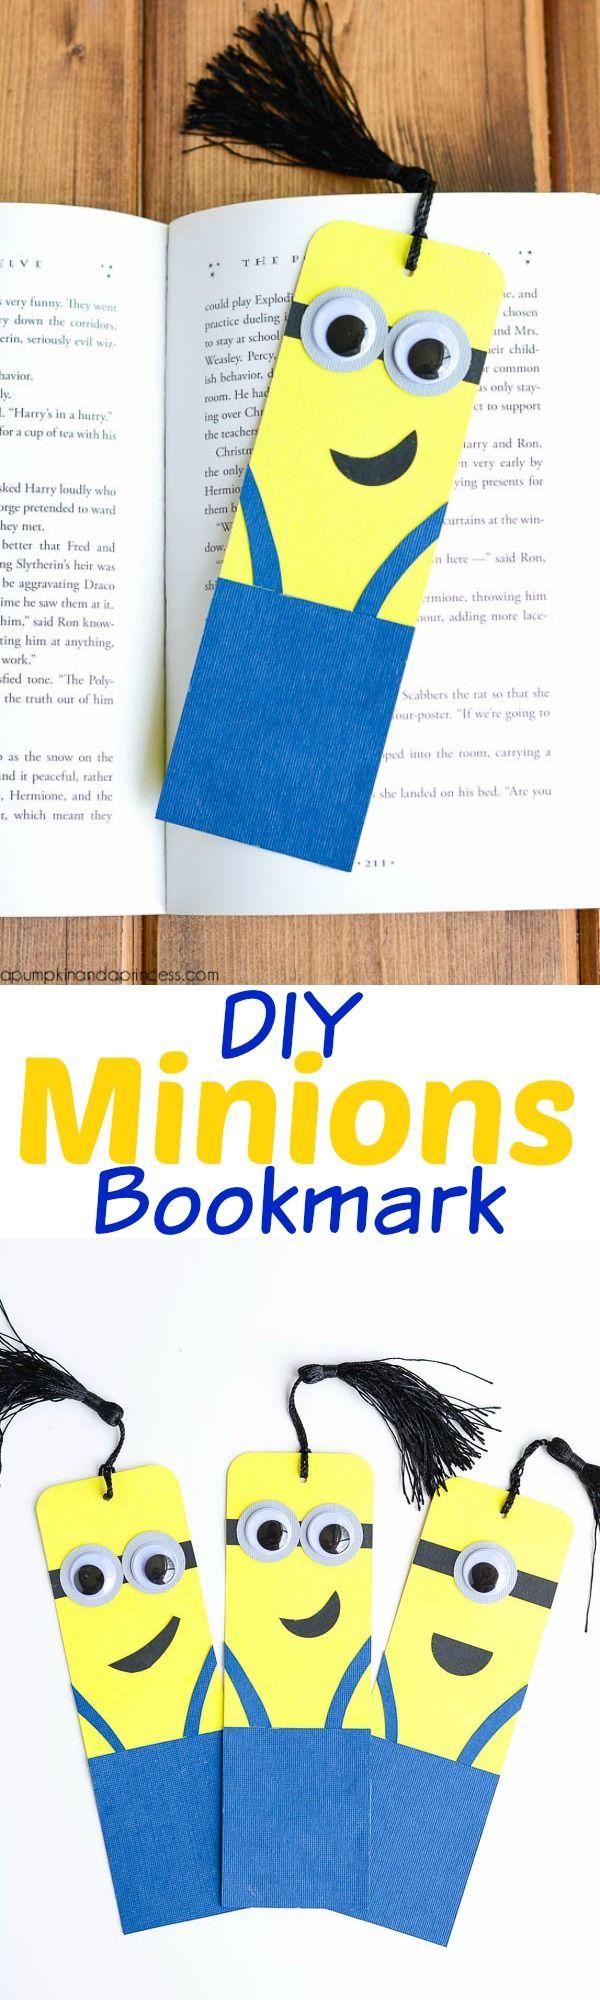 how-to-make-minions-bookmarks.jpg 600 × 2000 pixlar